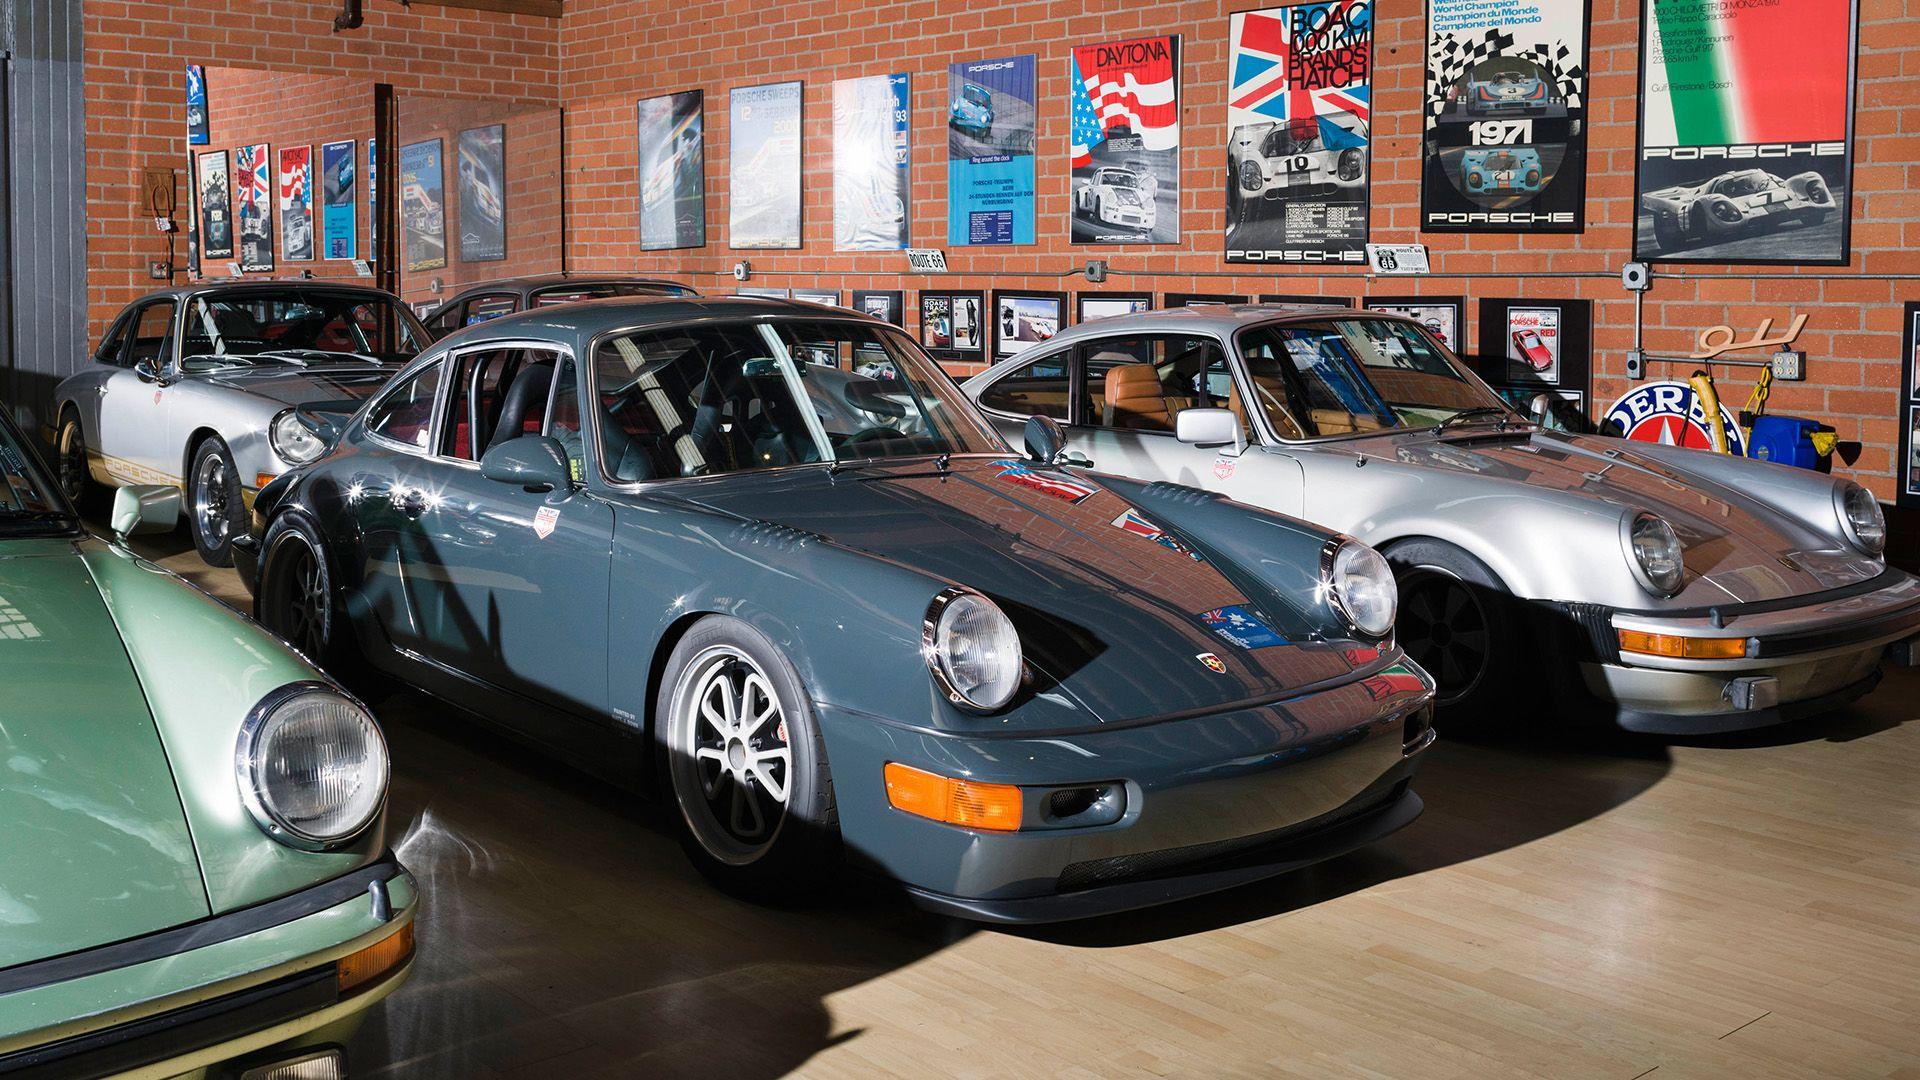 Take a 360-Video Tour of a Magnus Walker's Sweet Porsches